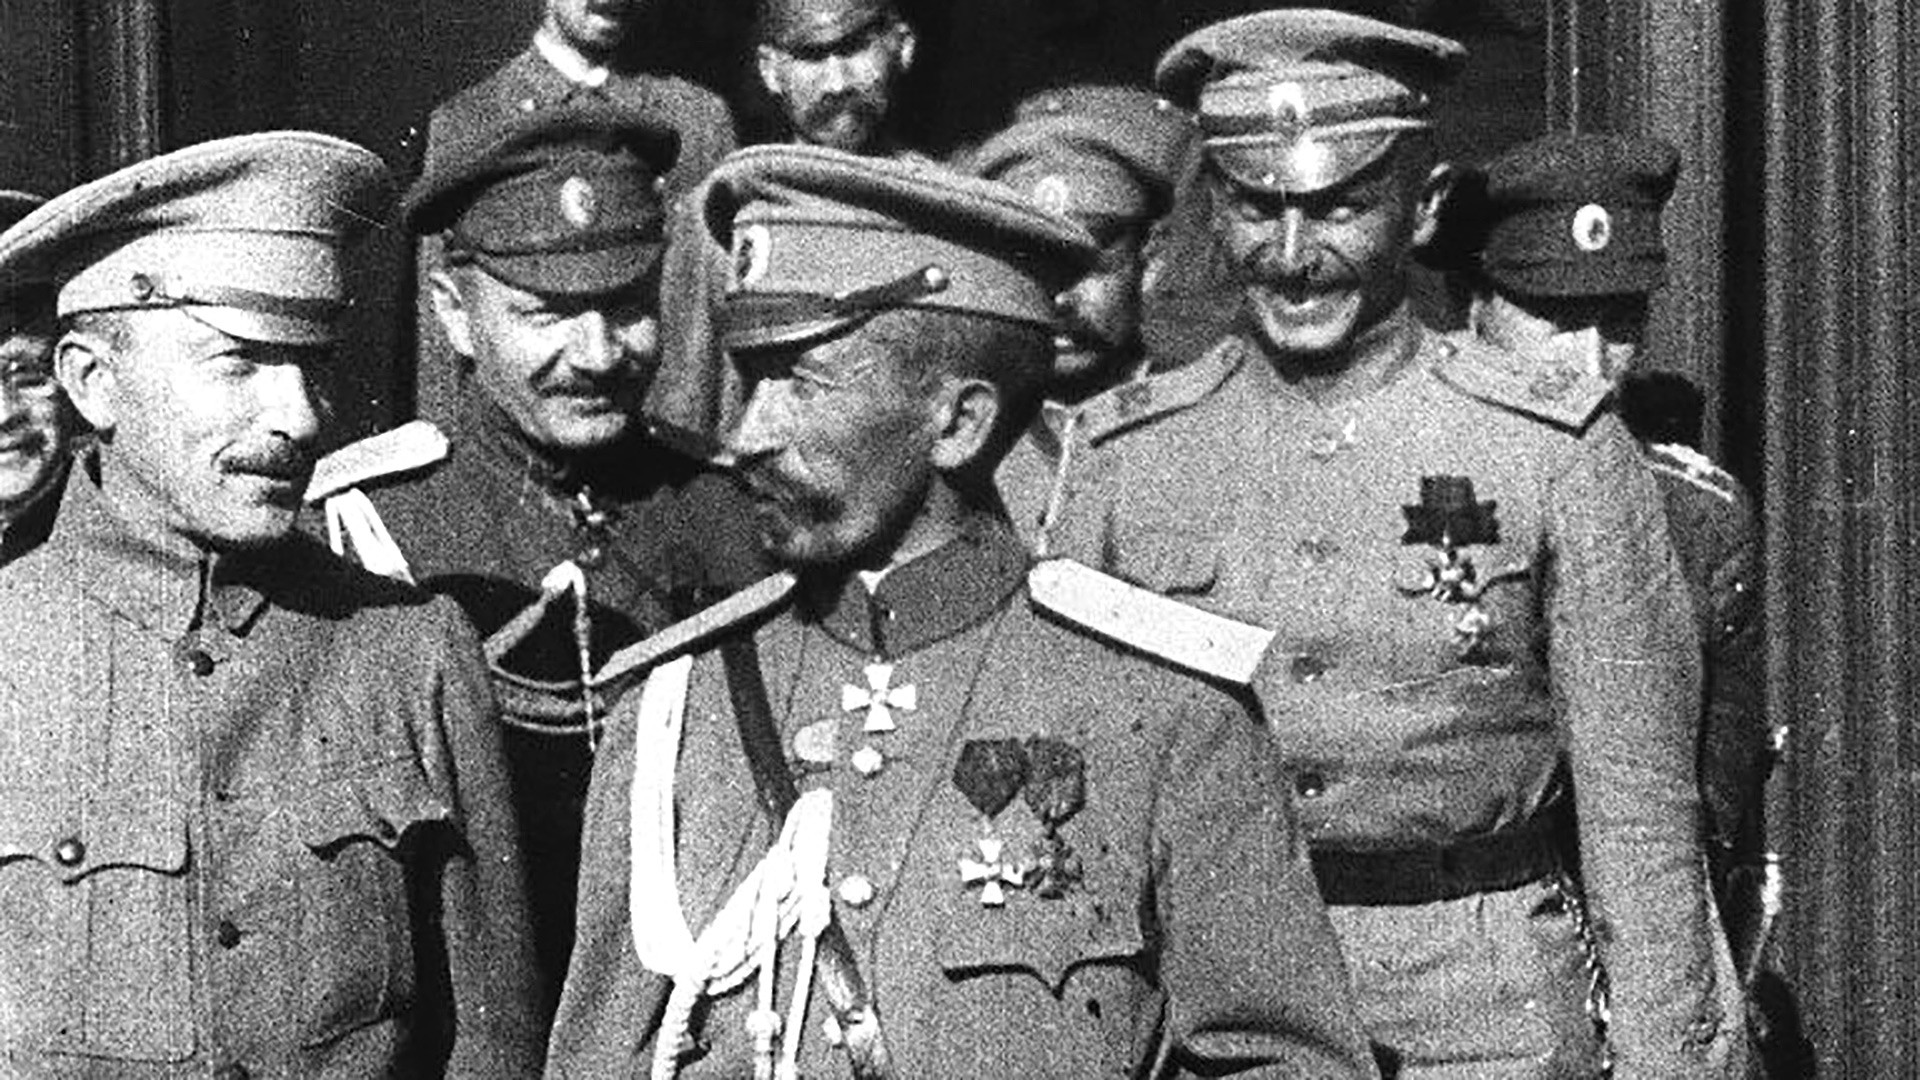 General Lawr Kornilow